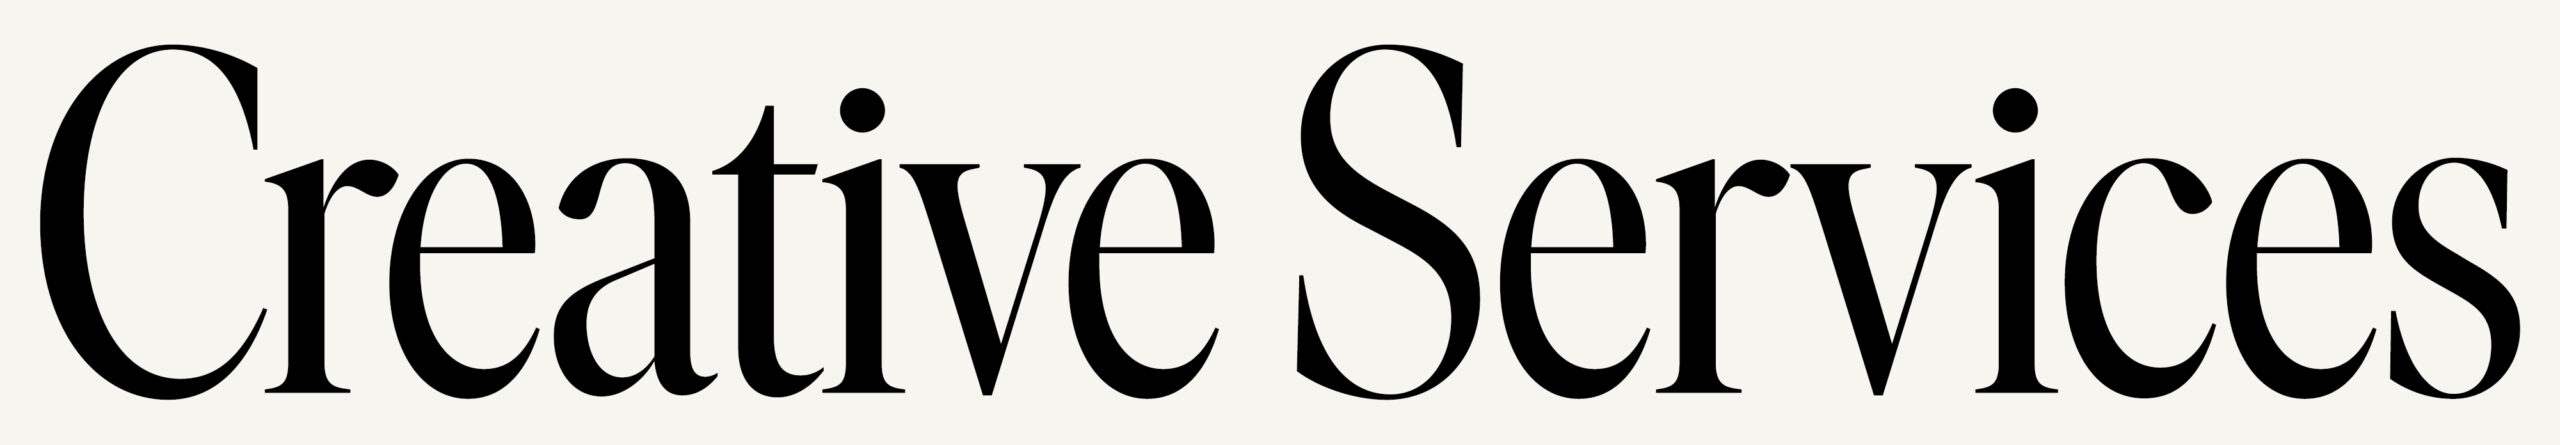 02-Creative-Services-Type01